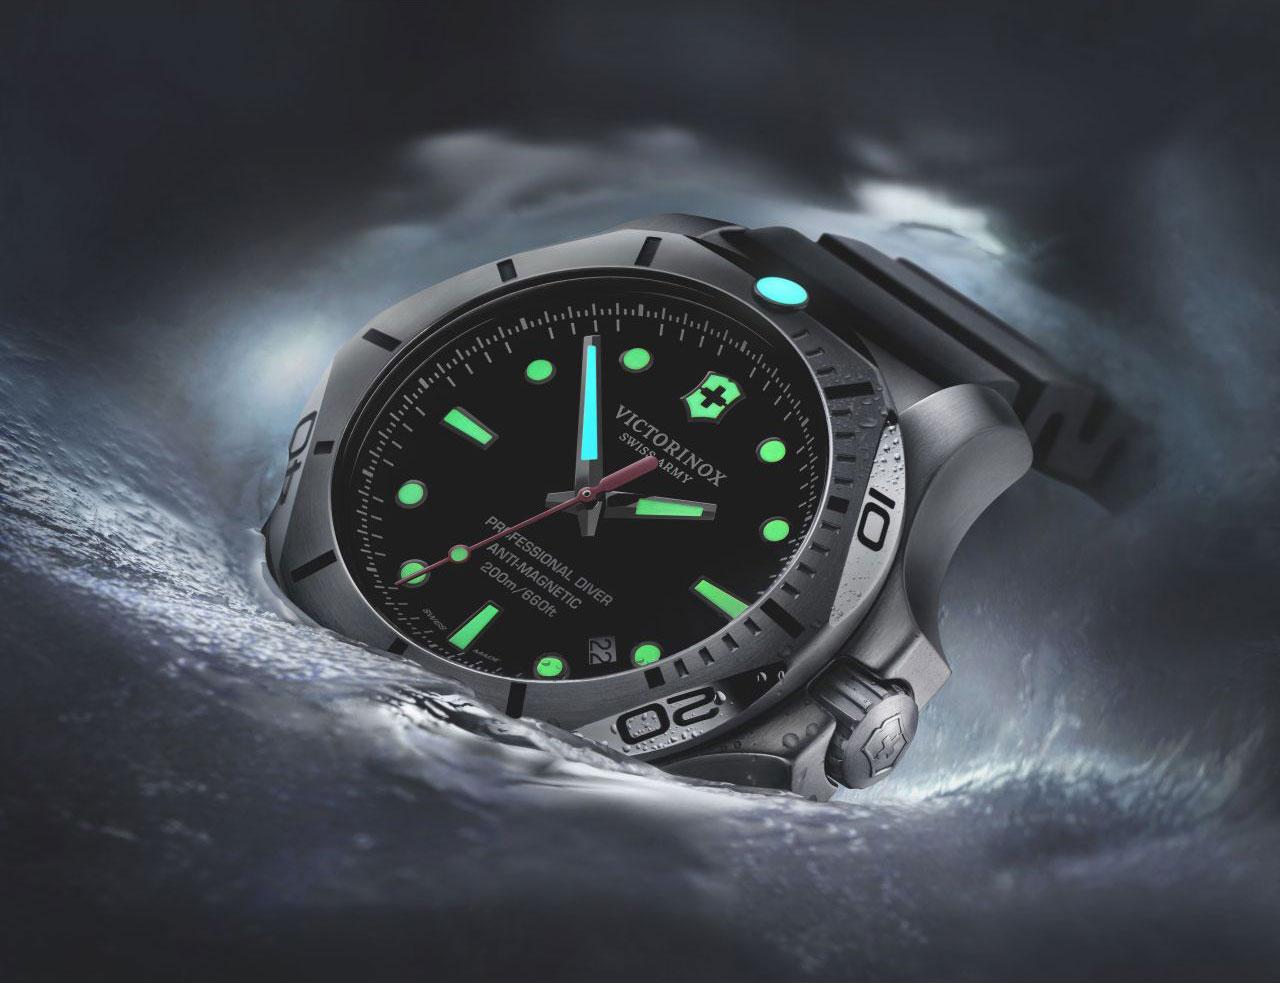 Meet the watch victorinox swiss army i n o x professional dive watch watch hunter watch for Dive watch